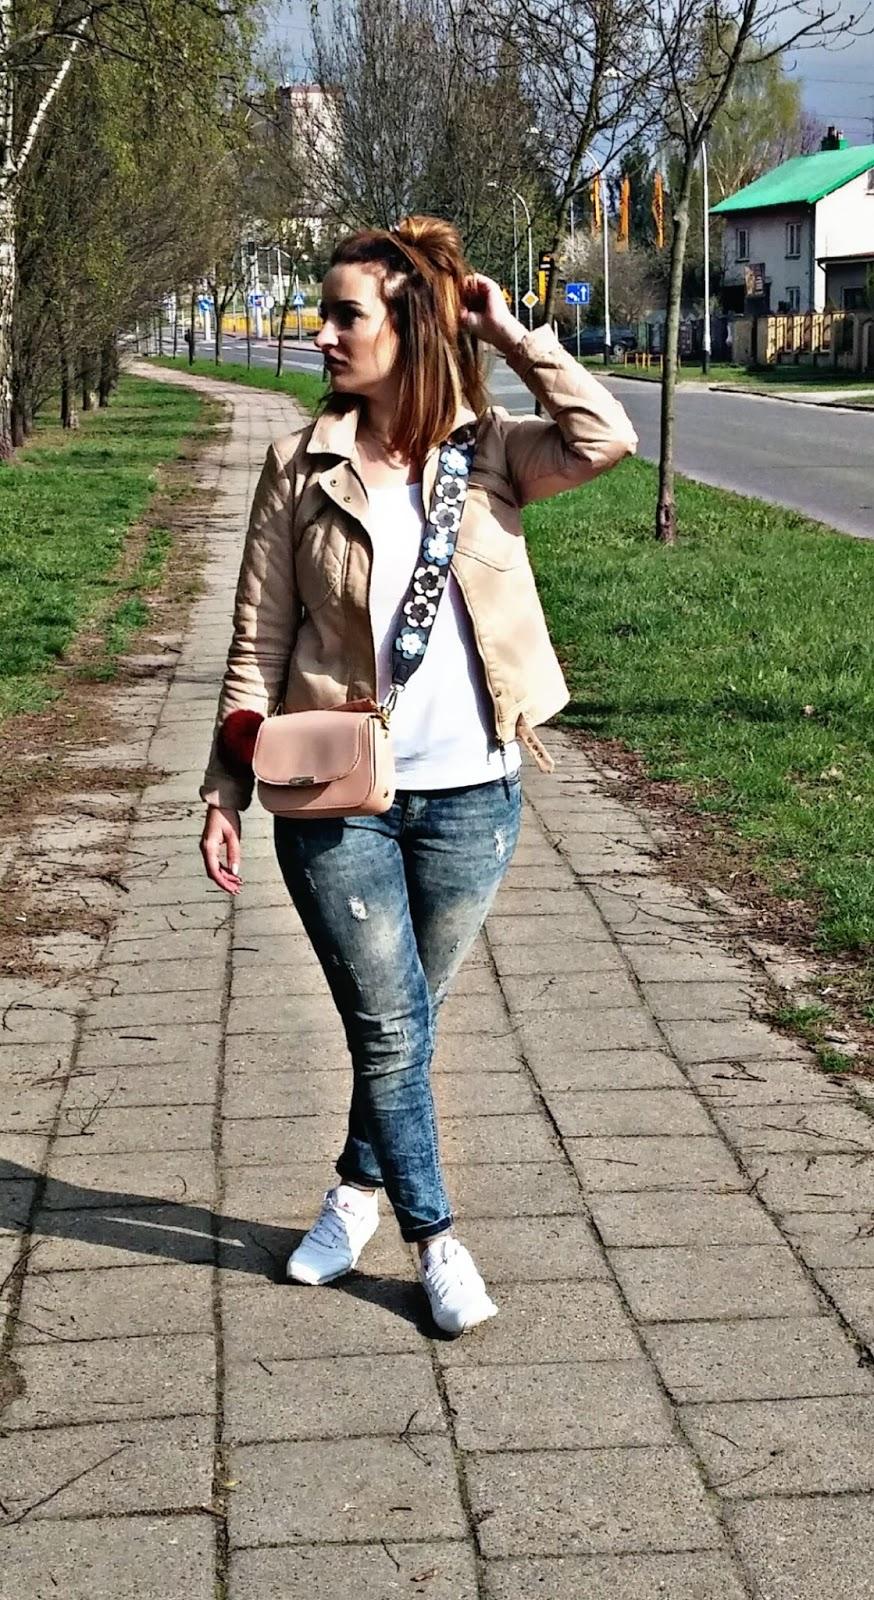 torebka orsay, wiosenna stylizacja, stylizacja na spacer, stylizacja miejska, stylizacja sportowa,  reebok classic,  reebok , buty sportowe reebok classic, busty sportowe reebok, adidasy reebok classic, adidasy reebok, spodnie wytarte, jeansy wytarte, jeansy marmurkowe, dzinsy marmurkowe,  spodnie marmurkowe, stylizacja miejska,  moda, fashion, justmeblog, blog modowy, blog lifestylowy,  blog, stylizacja, lifestye blog, fashion blog, fashion,  justmeblog88,  justmeblog,